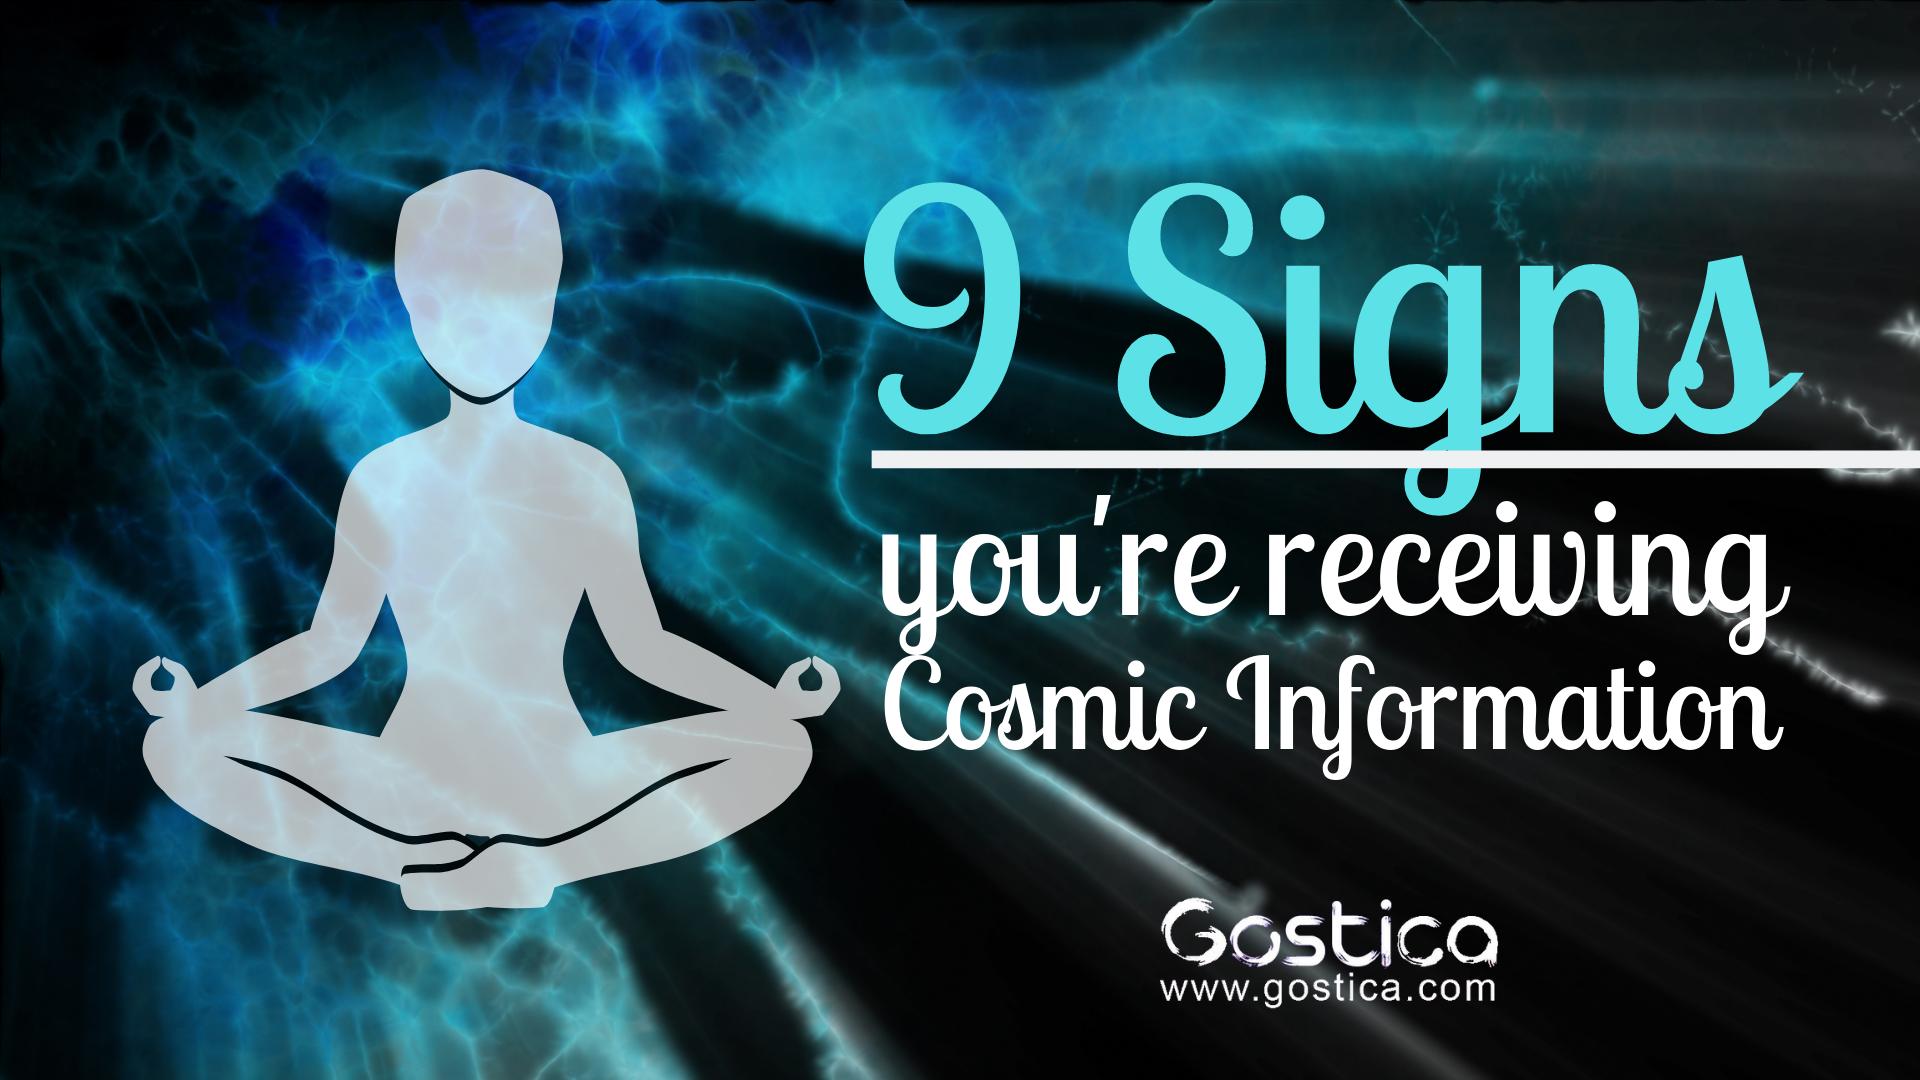 cosmic information